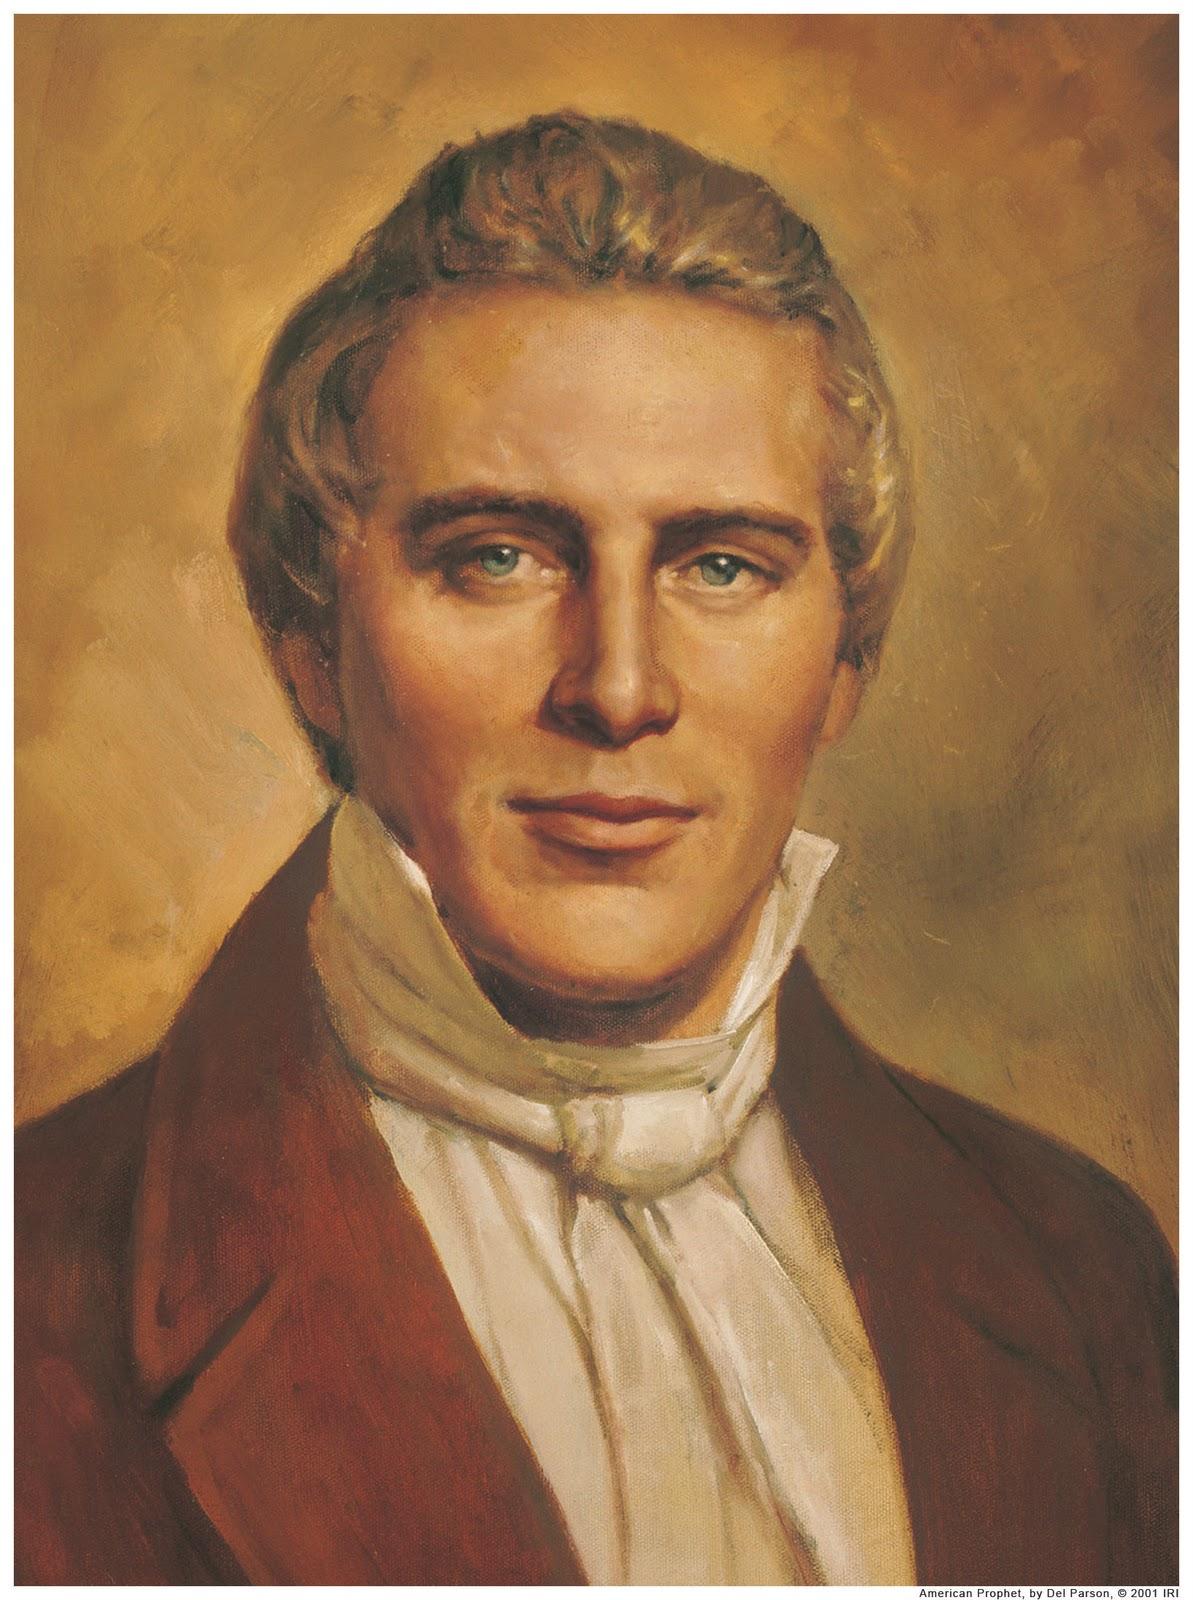 Joseph Smith  Founder of the Mormons